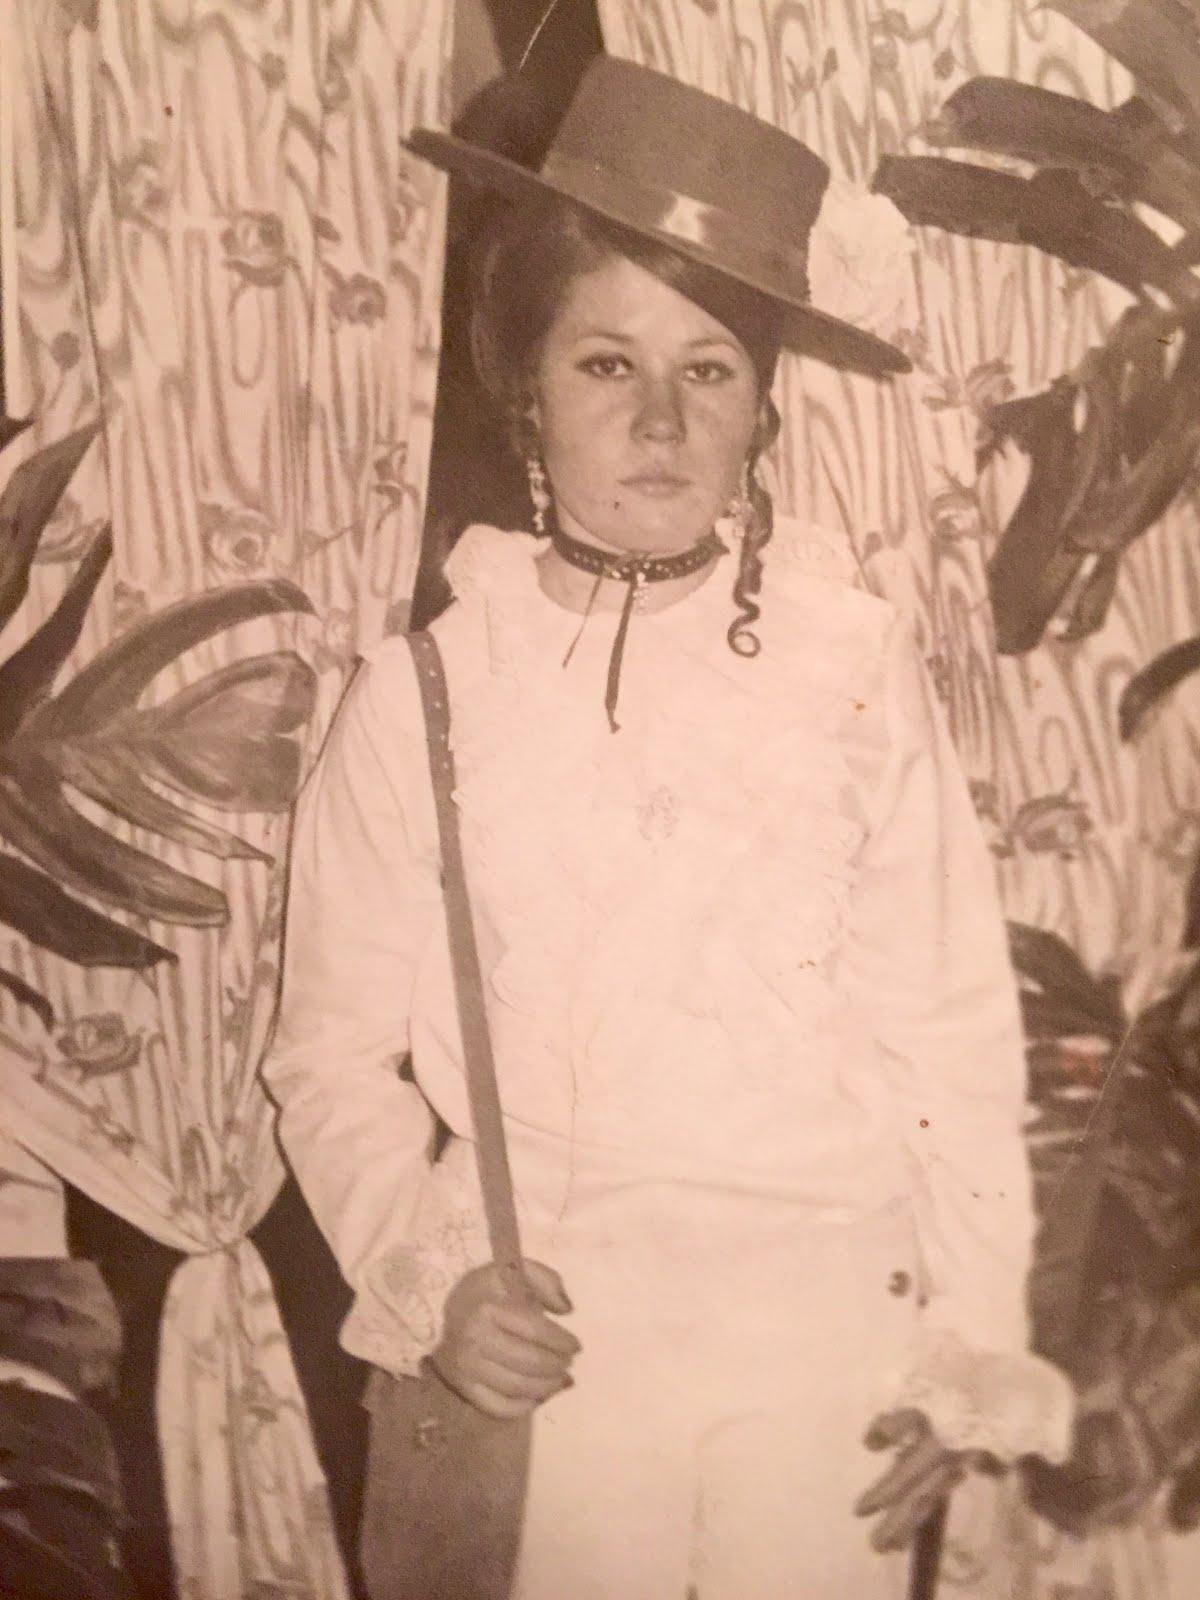 Ma. Josefa Marta, Pueblo Nuevo, Guanajuato 1975